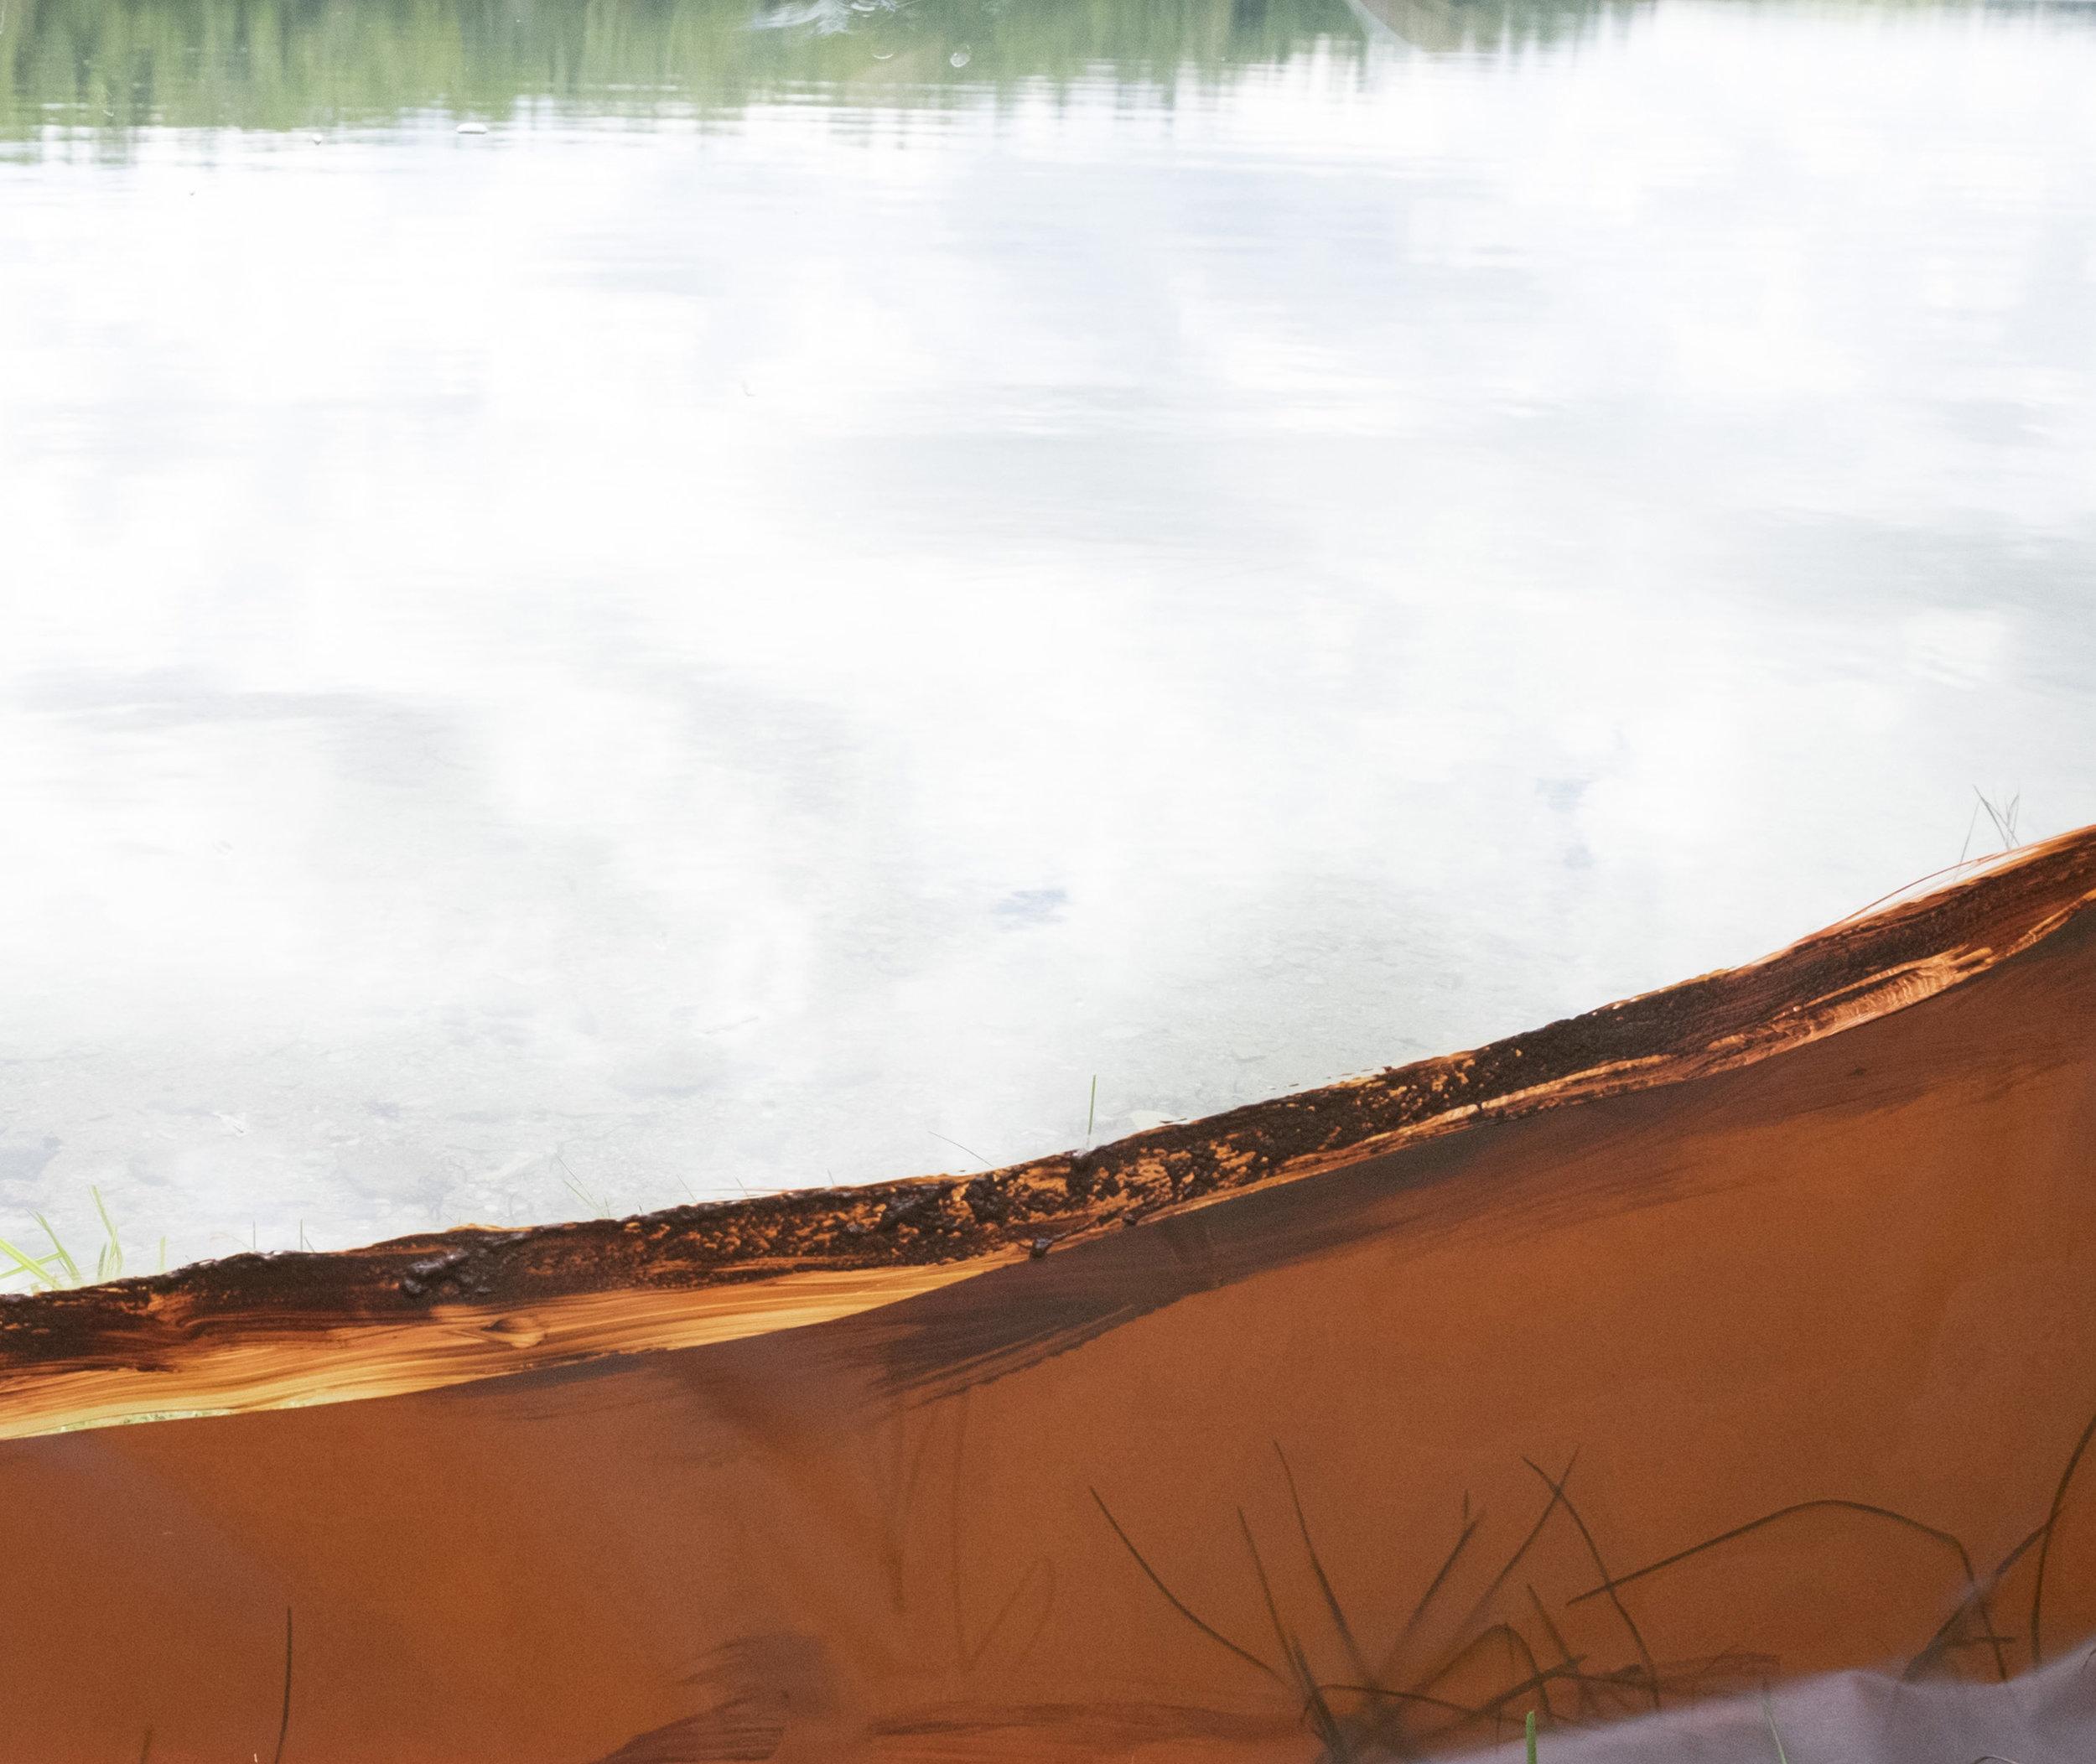 09.07.16 Tofte Lake (Water)